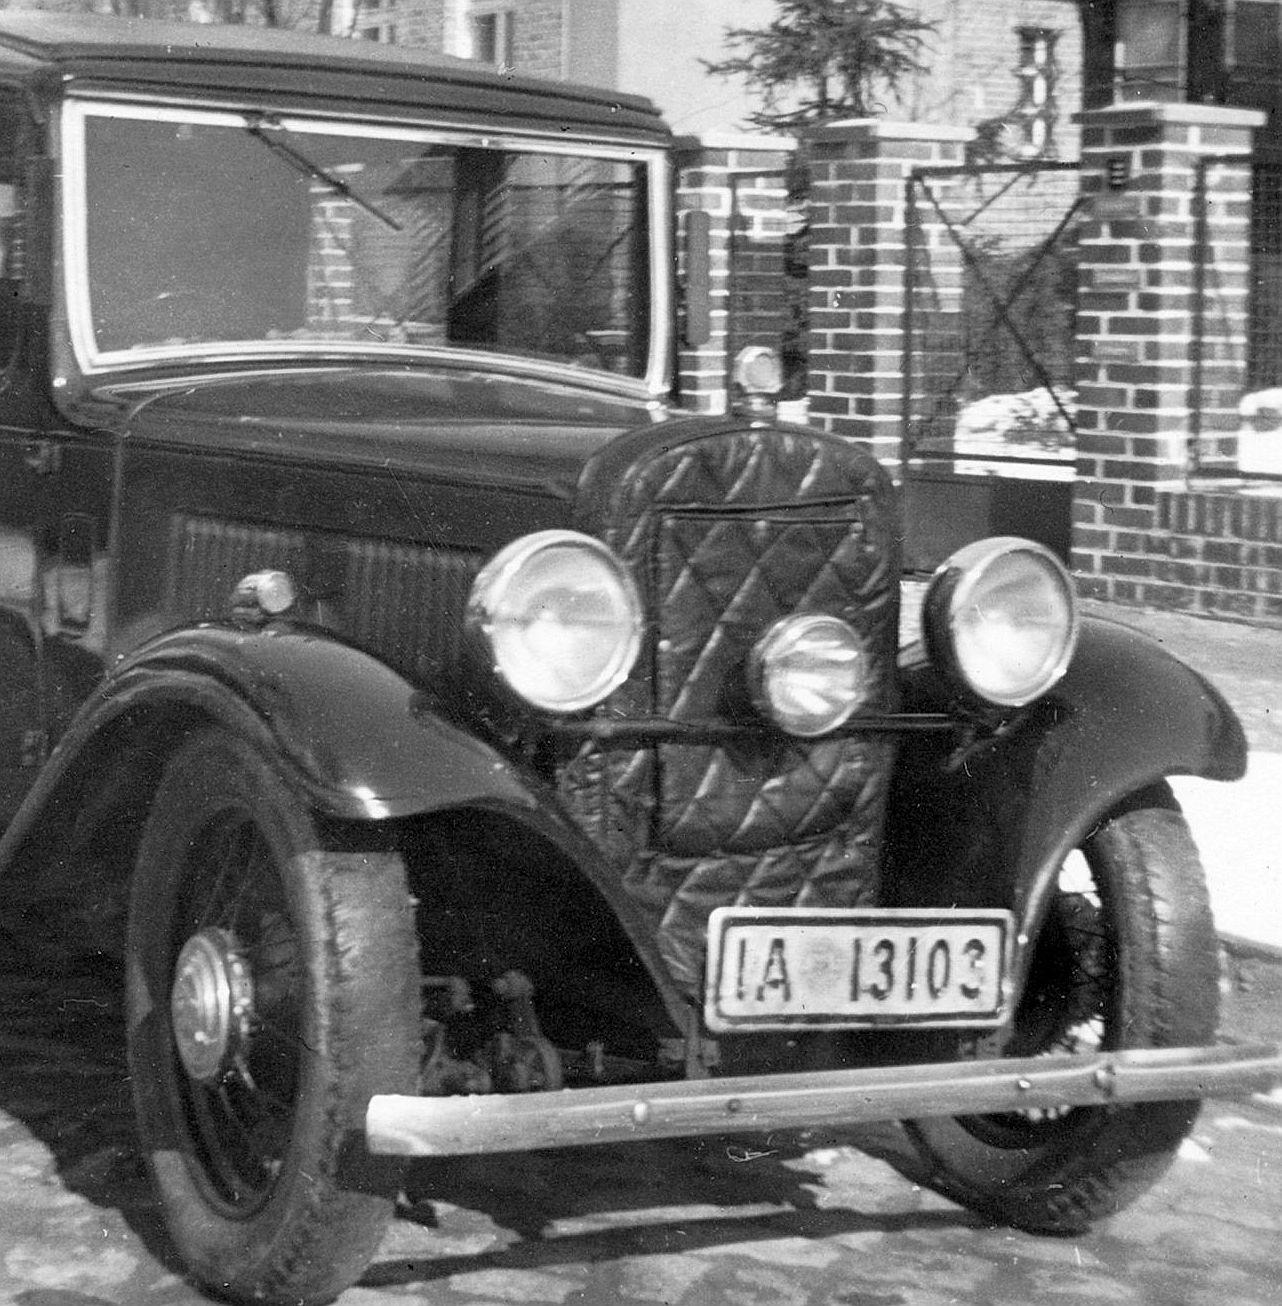 Austin_10-4_vor 1935_Frontpartie